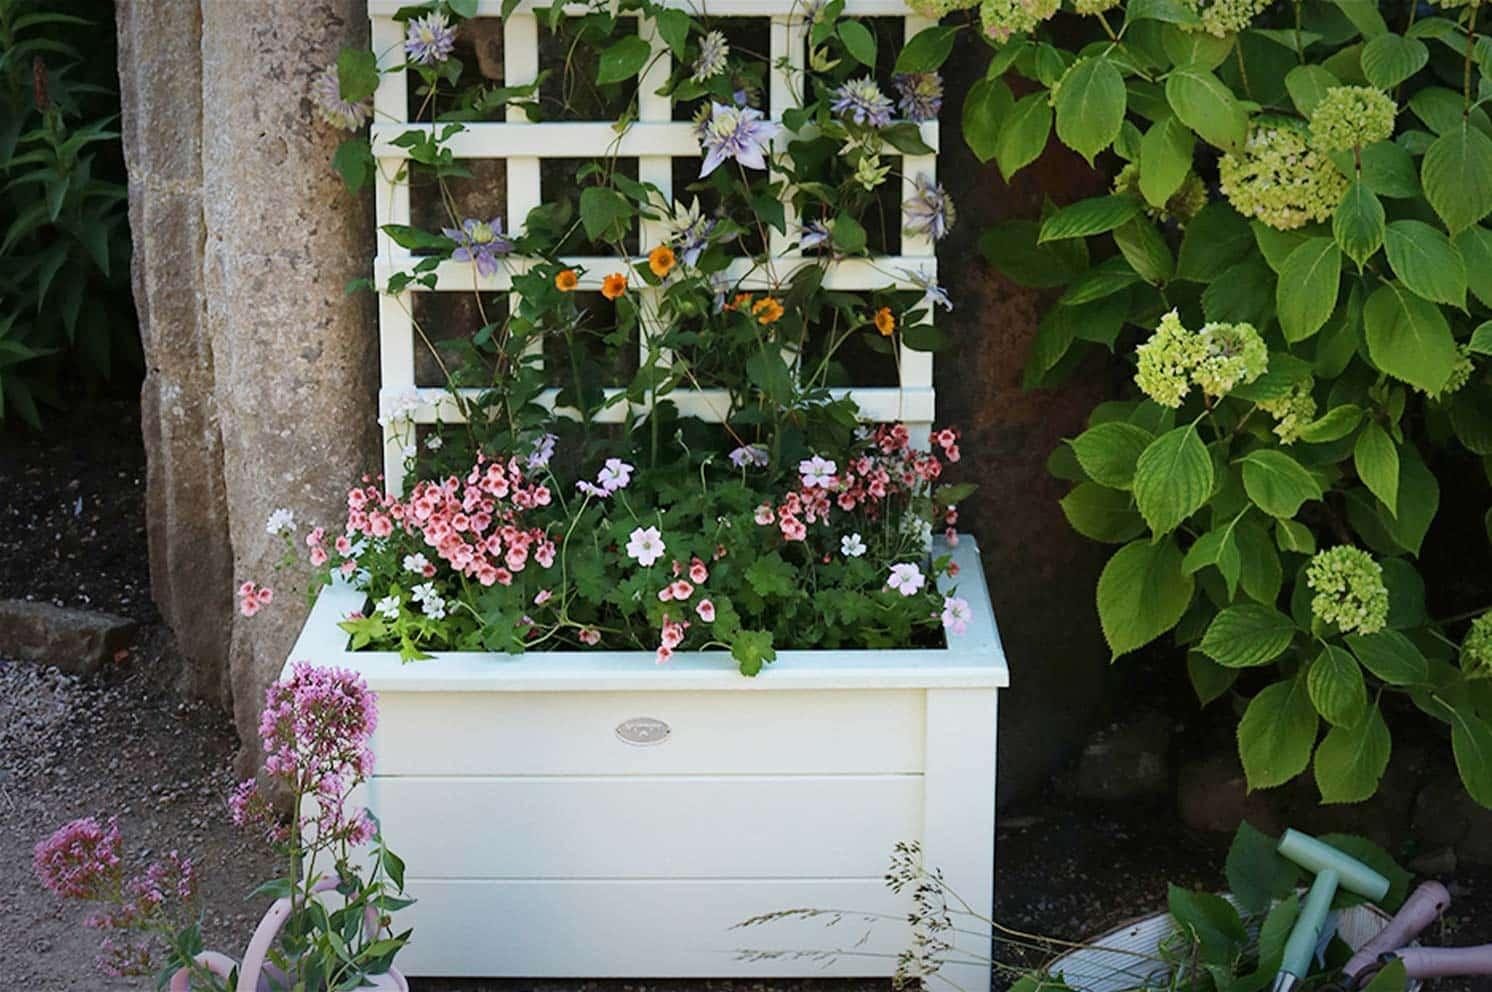 Thorndown-Paint-Small-Trellis-Planter-Blog-Post-Header